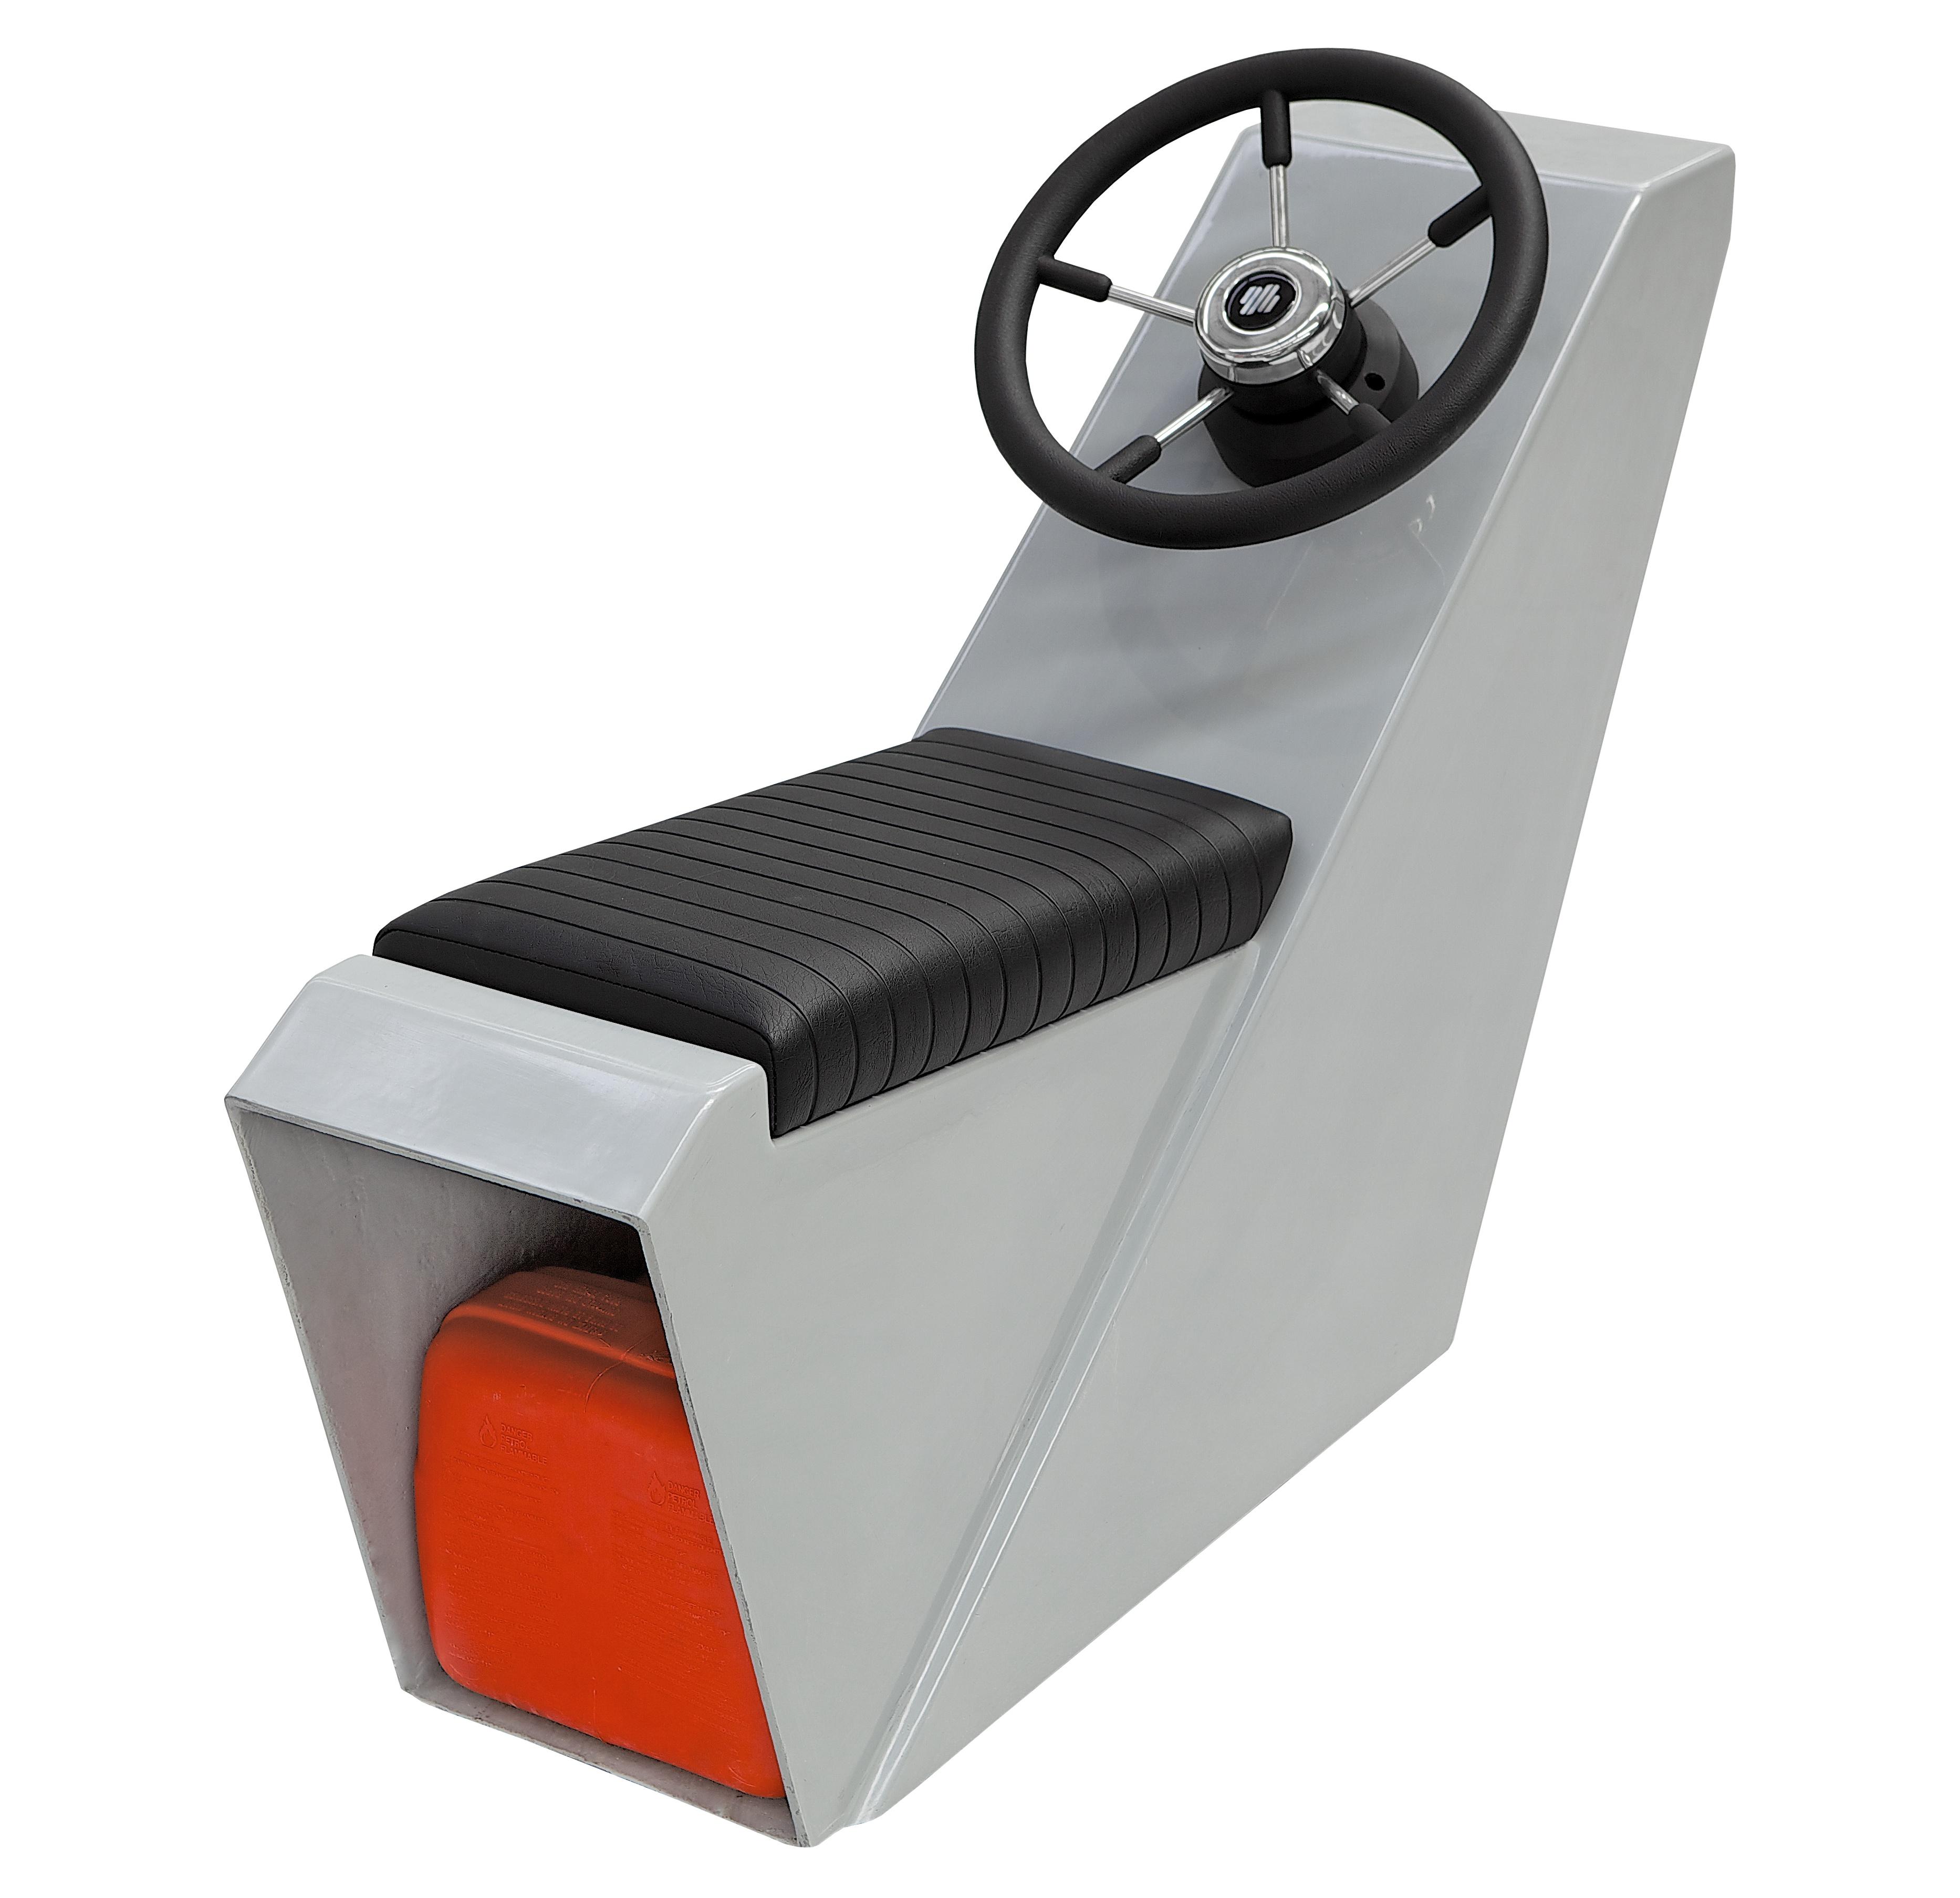 Jockey Console S400 ex steering